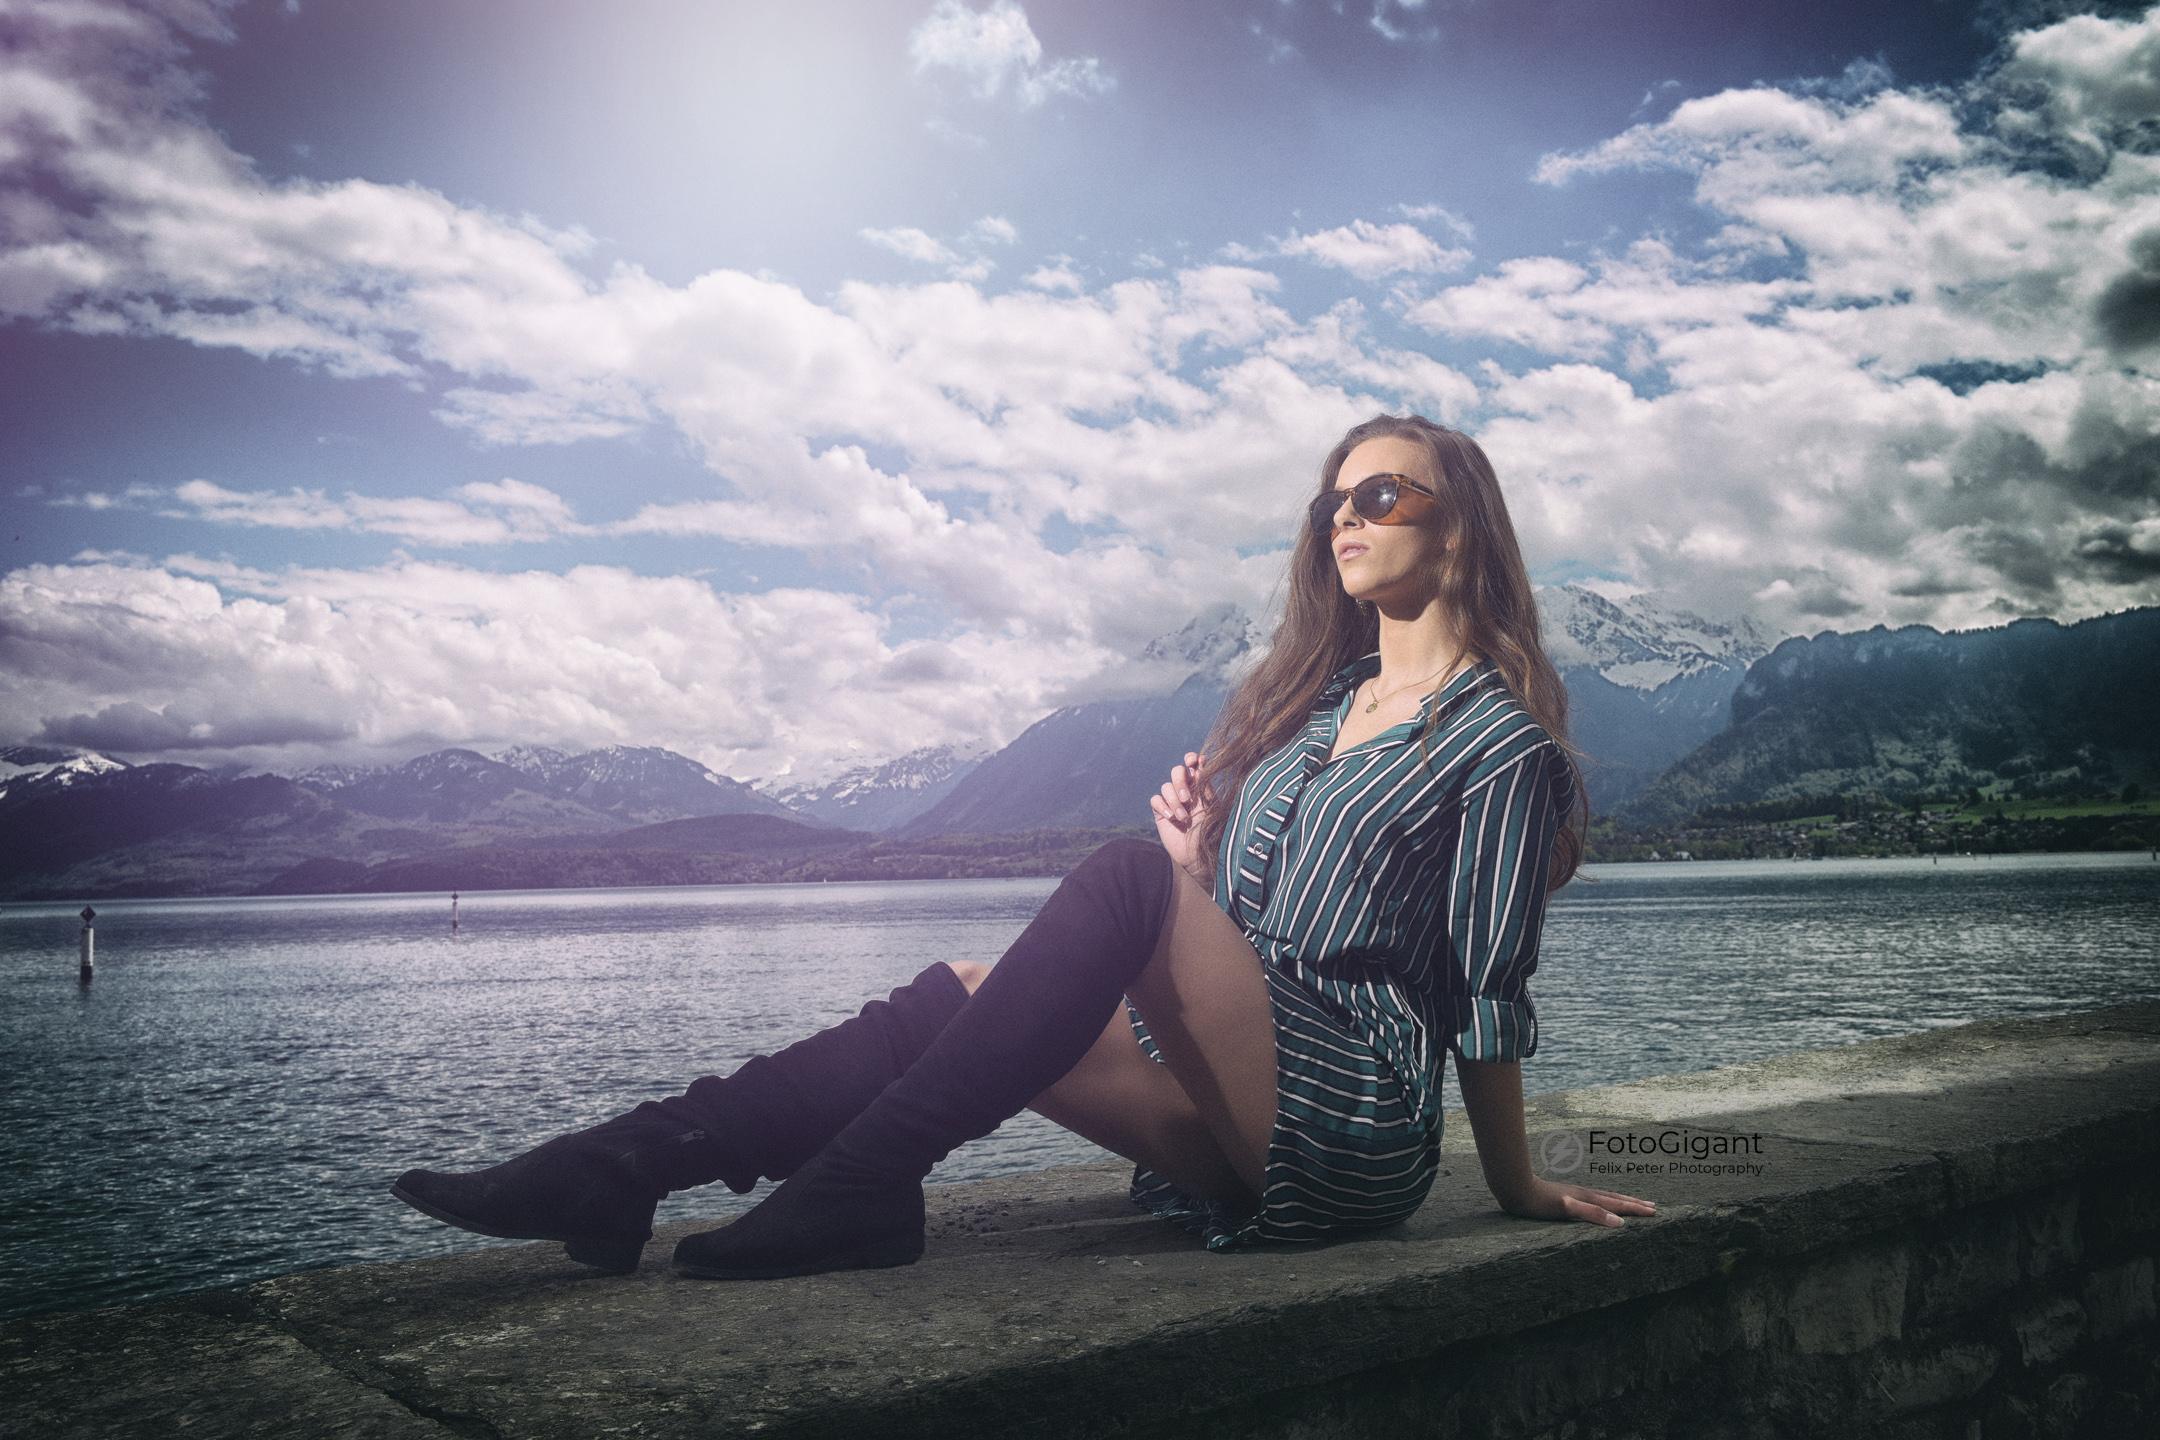 Model-Albina_by_FotoGigant_01.jpg